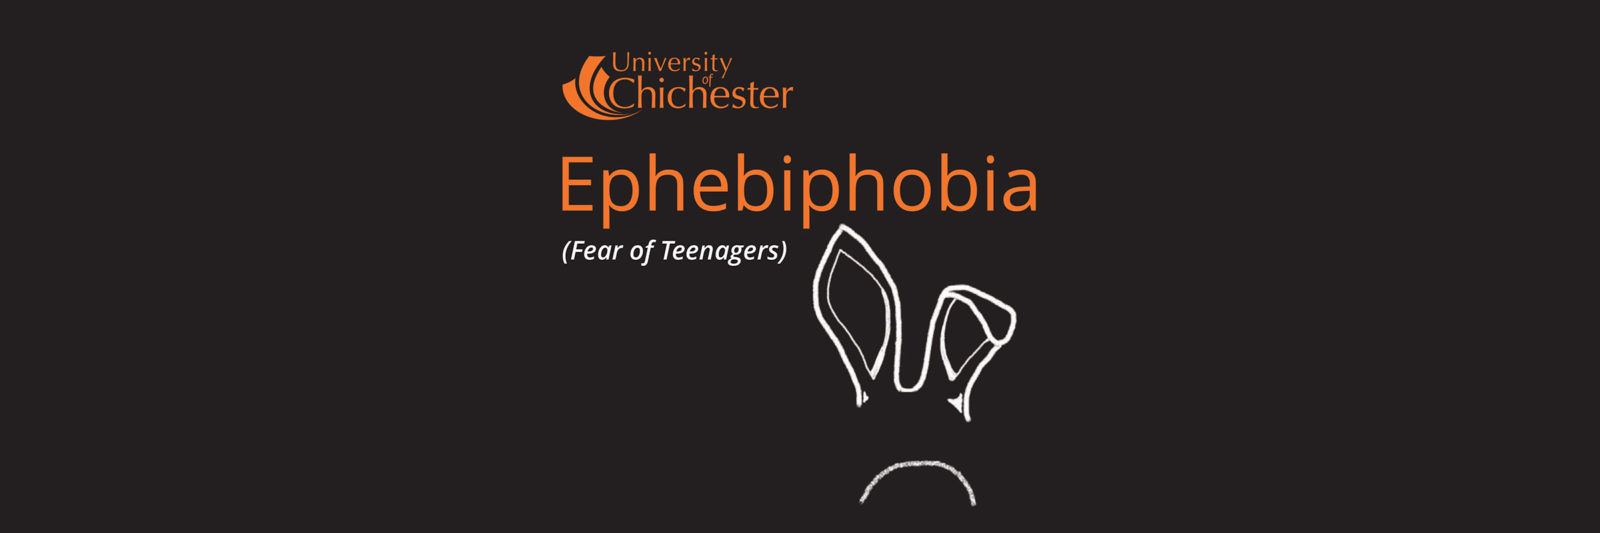 Ephebiphobia-Spring2019